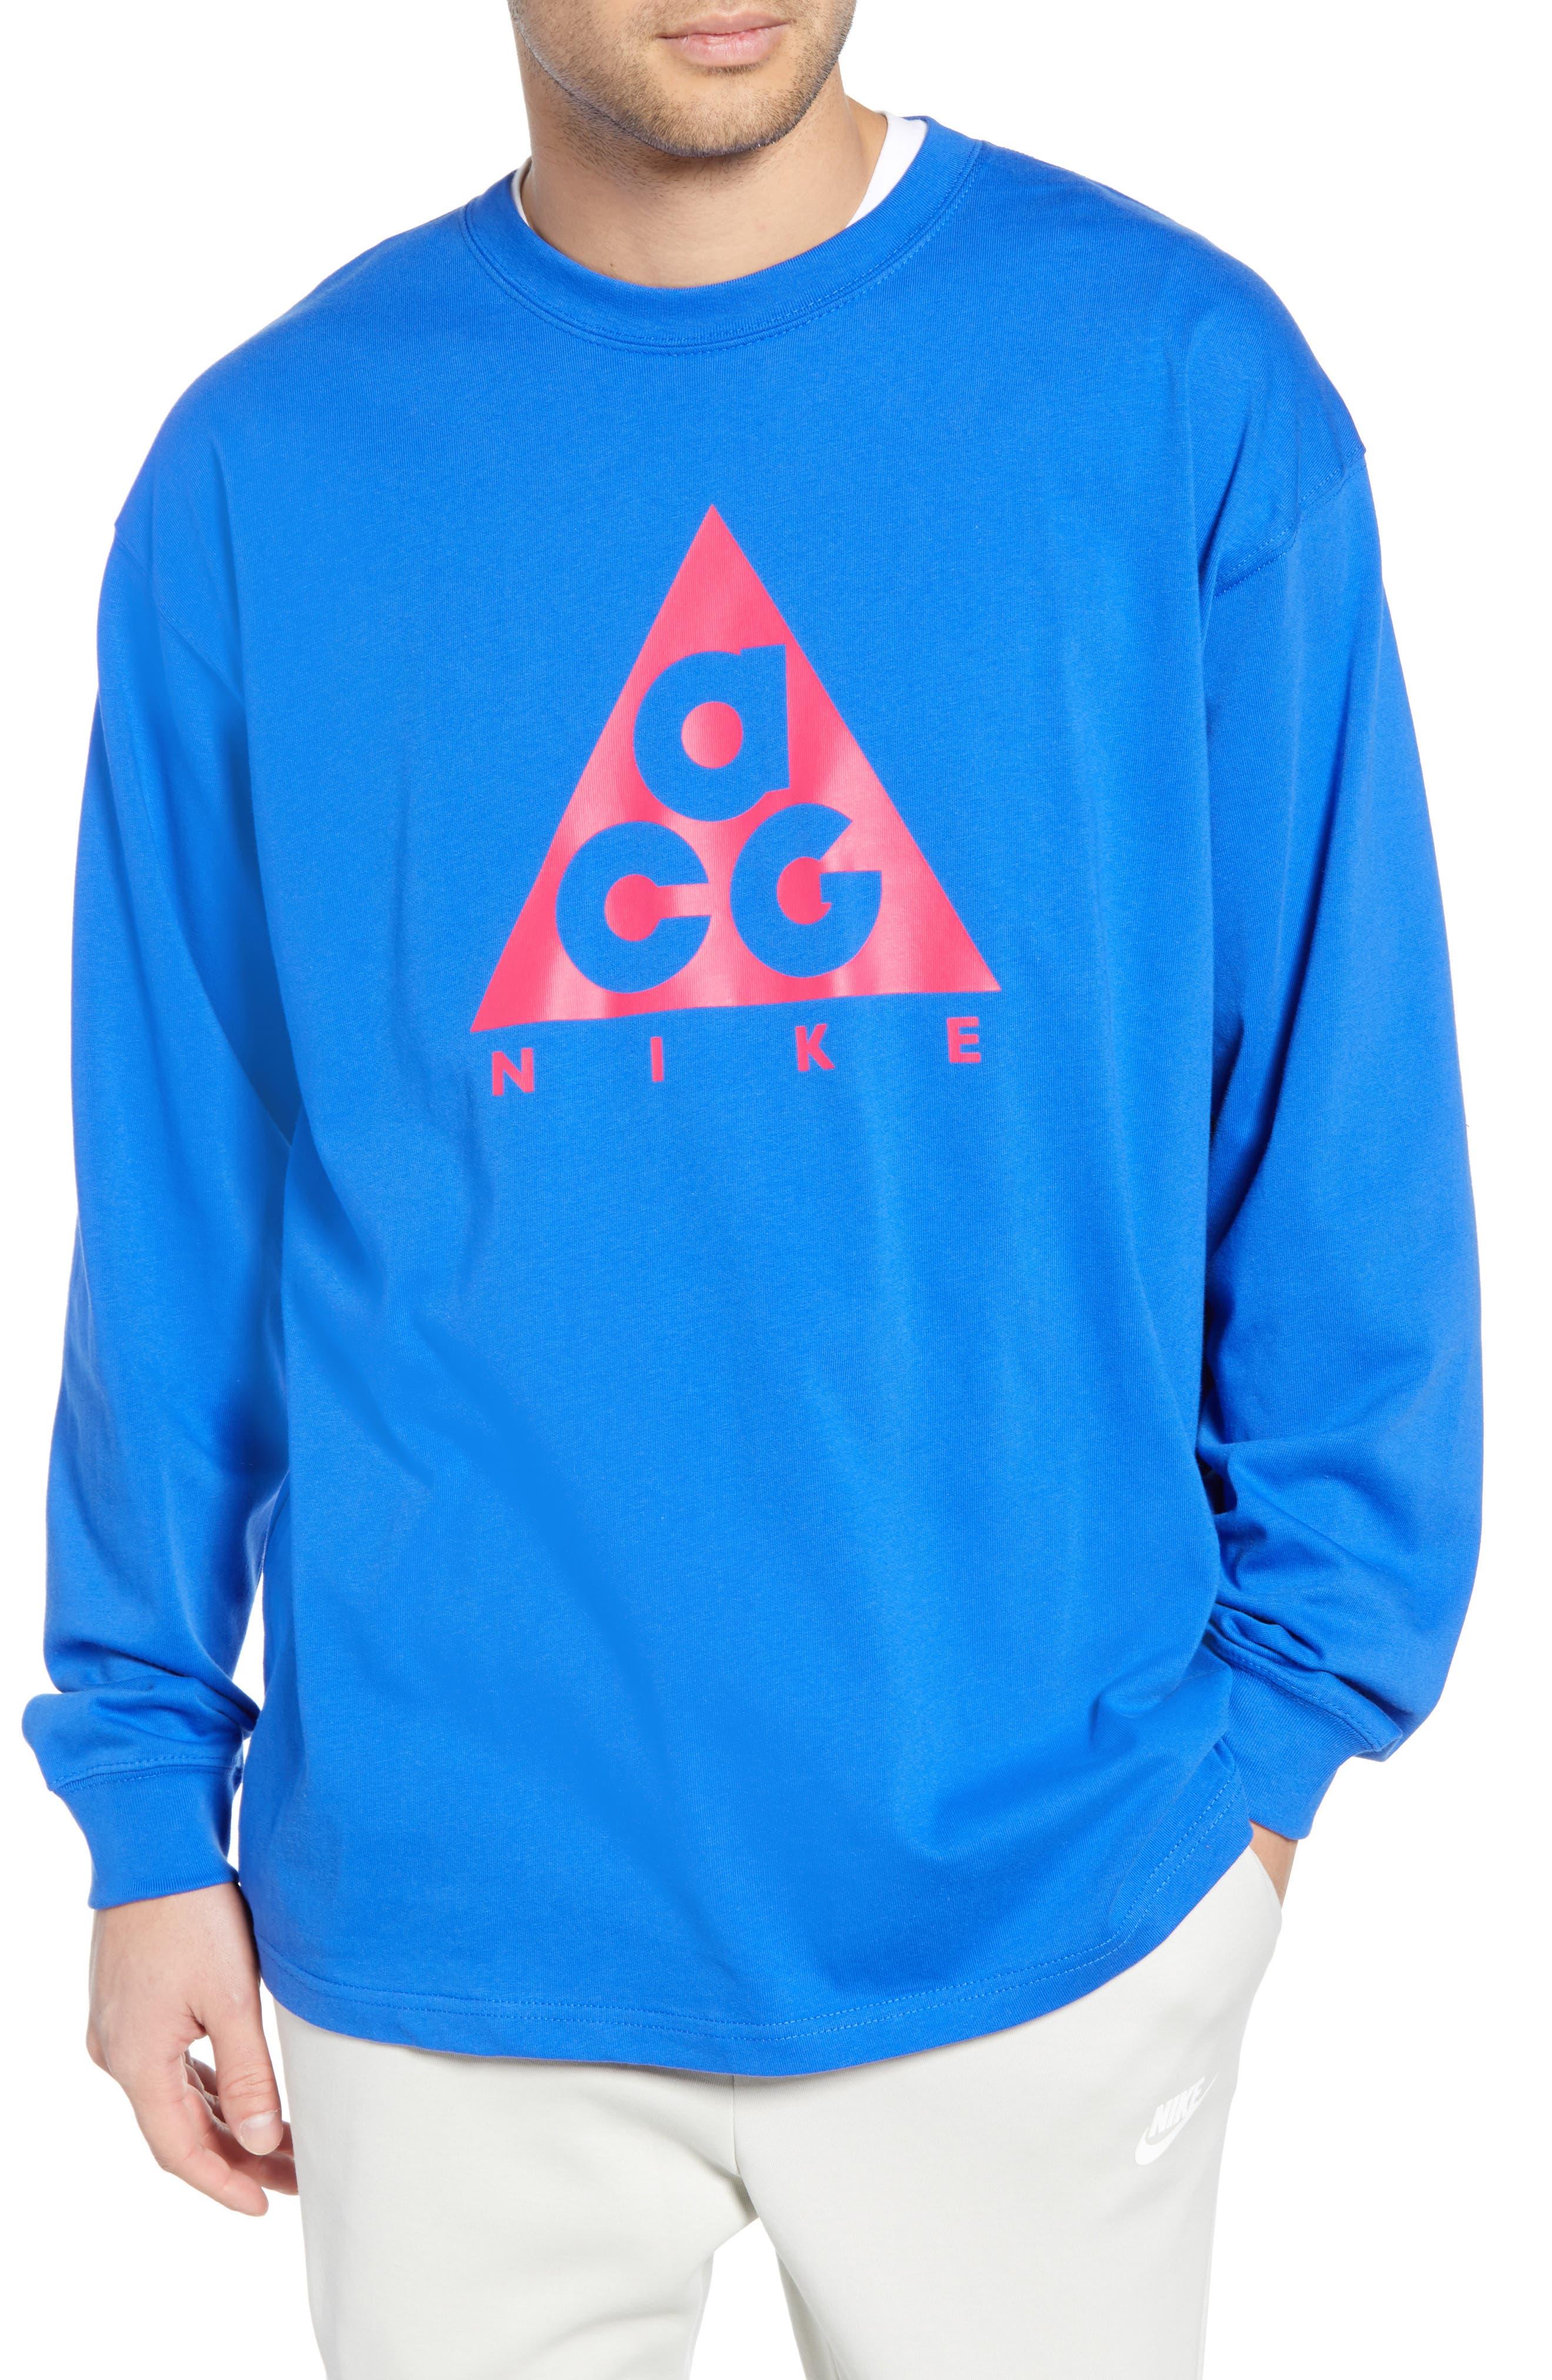 Nike Nrg All Conditions Gear Logo T-Shirt, Blue